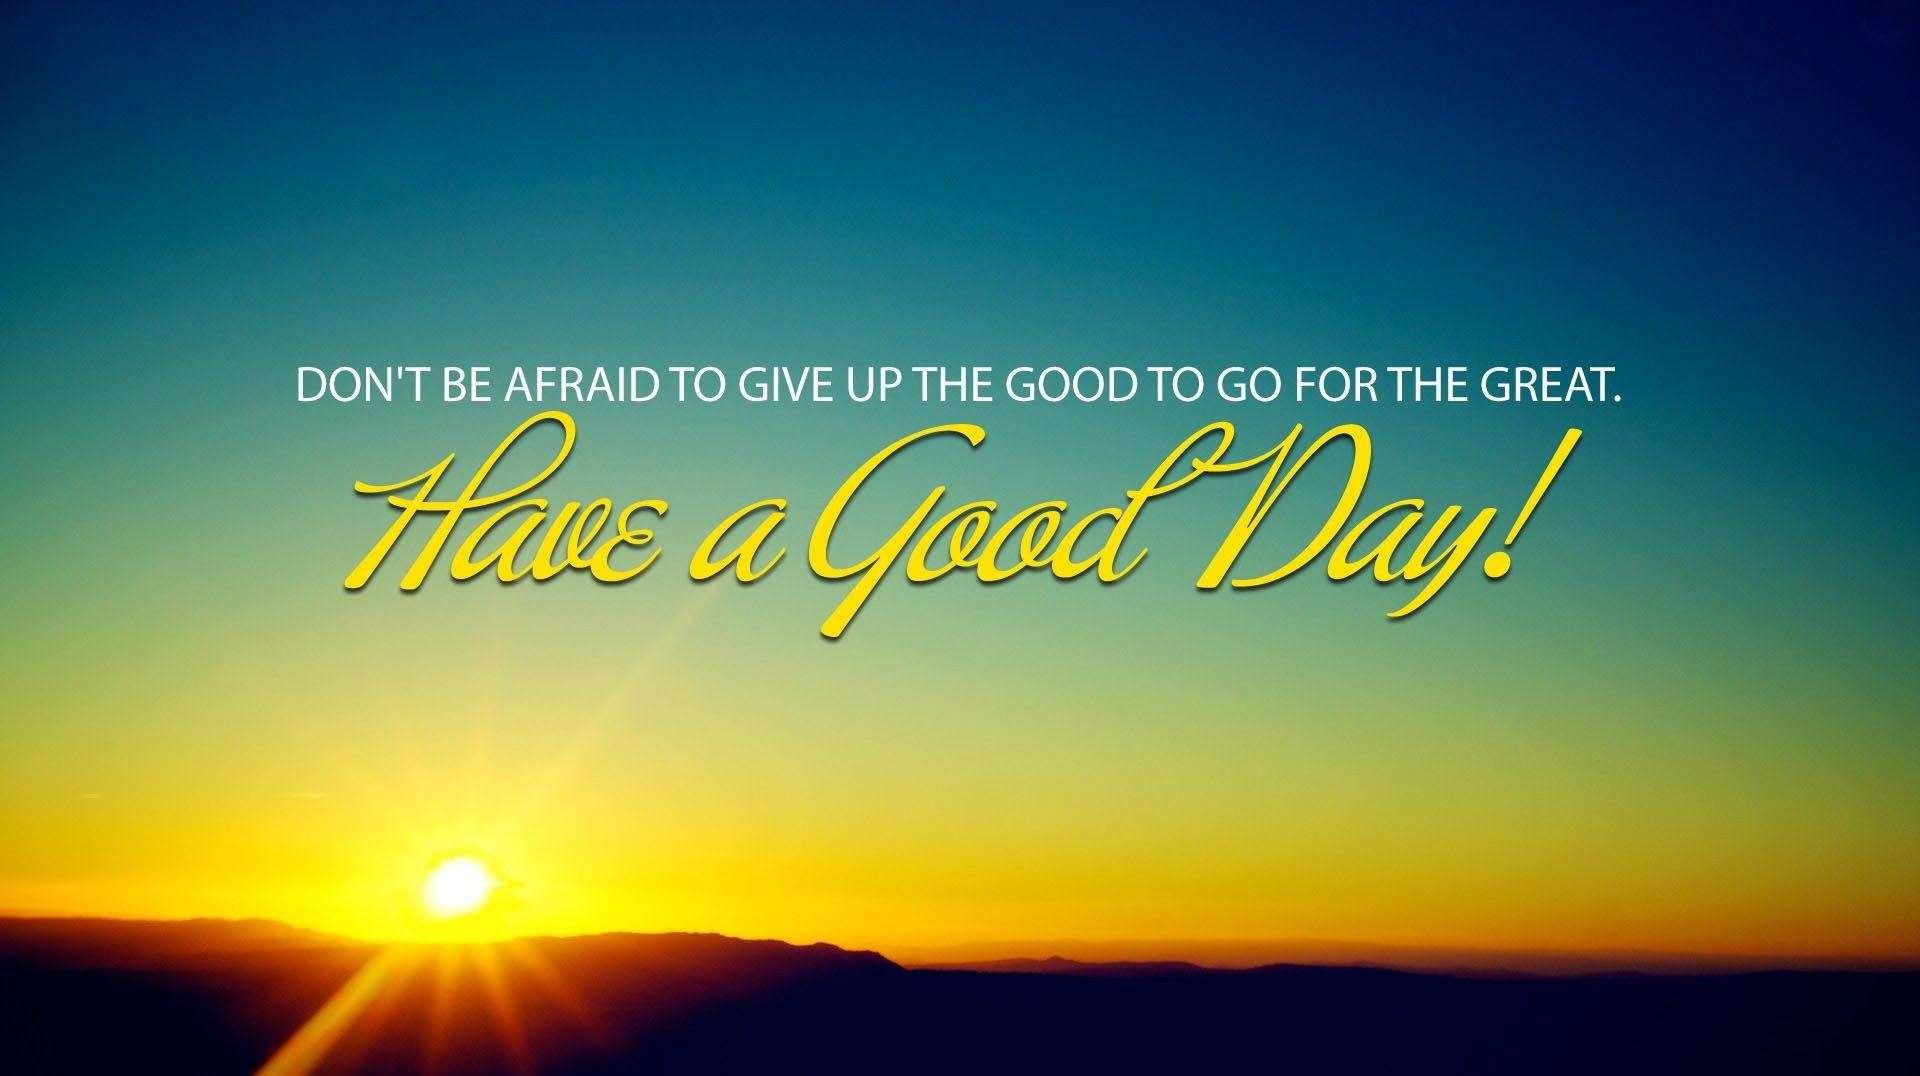 Have a gooda day - quote inspirational | goodmorningpics com